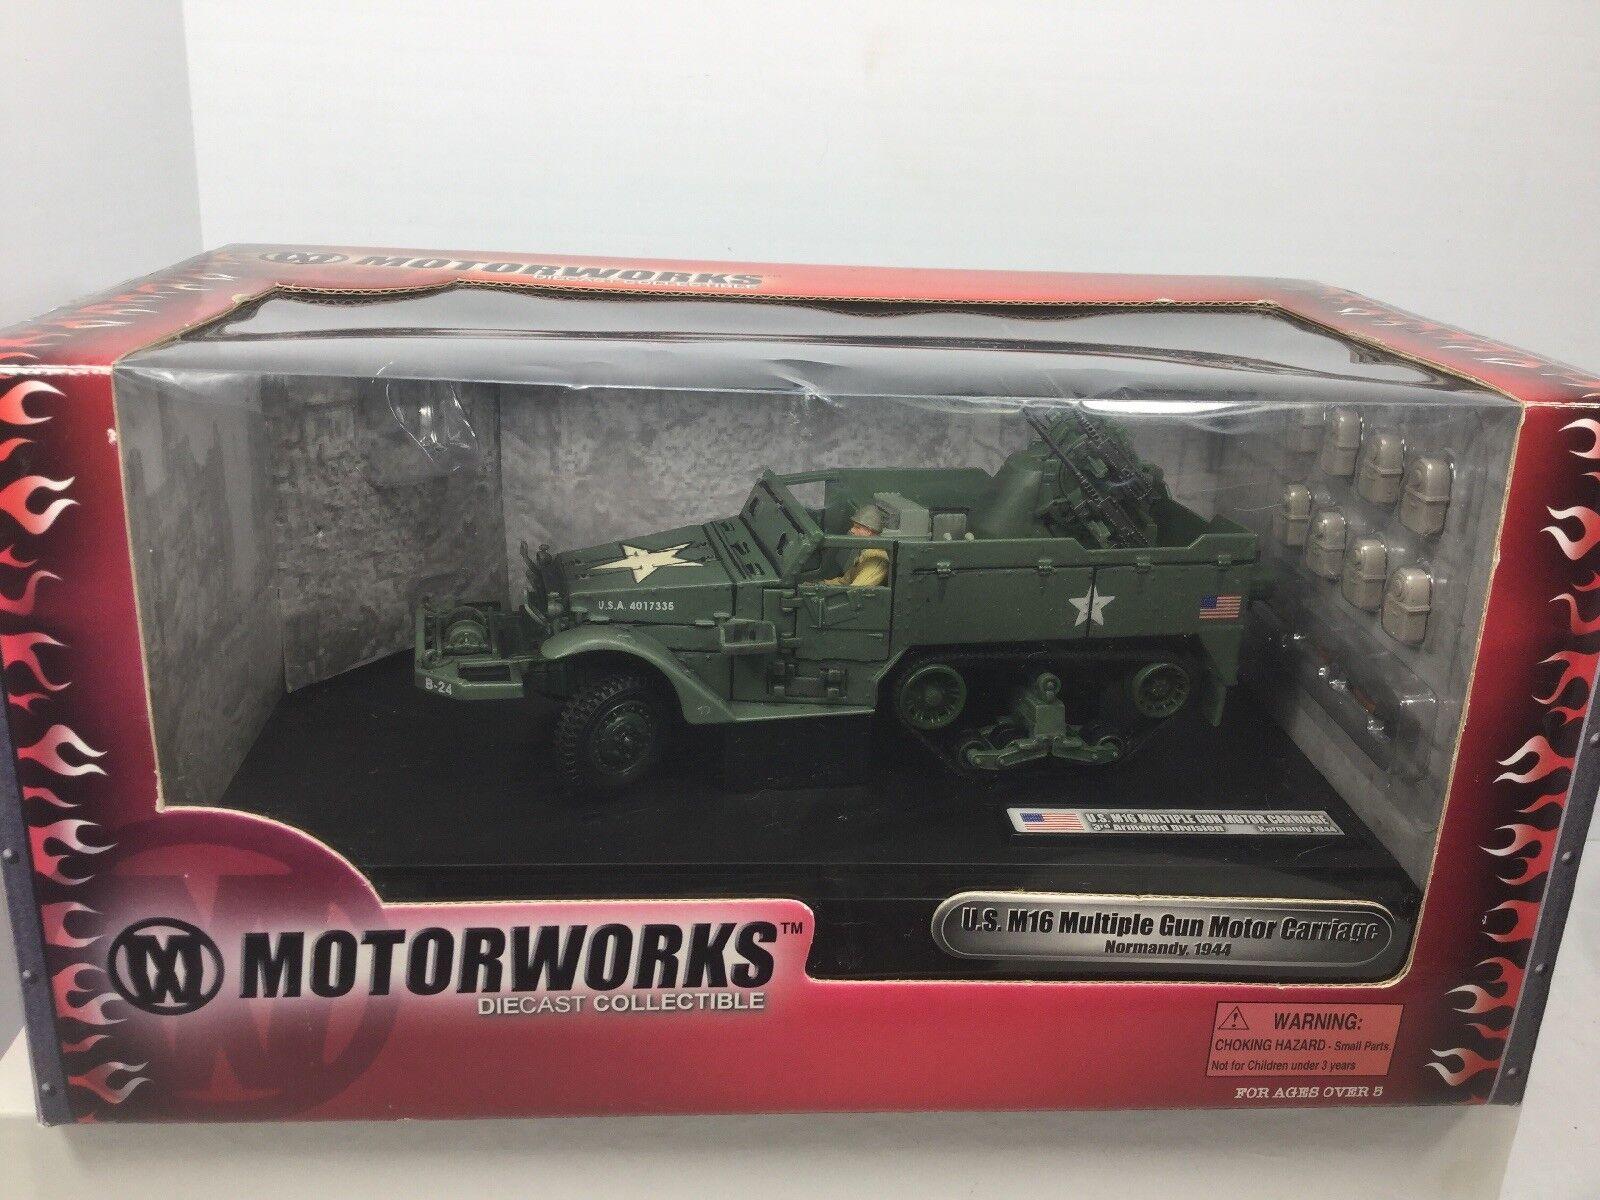 1 32 Motorworks Diecast nos M16 motorCocheriage Semioruga Ult. soldado X D Segunda Guerra Mundial Nuevo En Caja